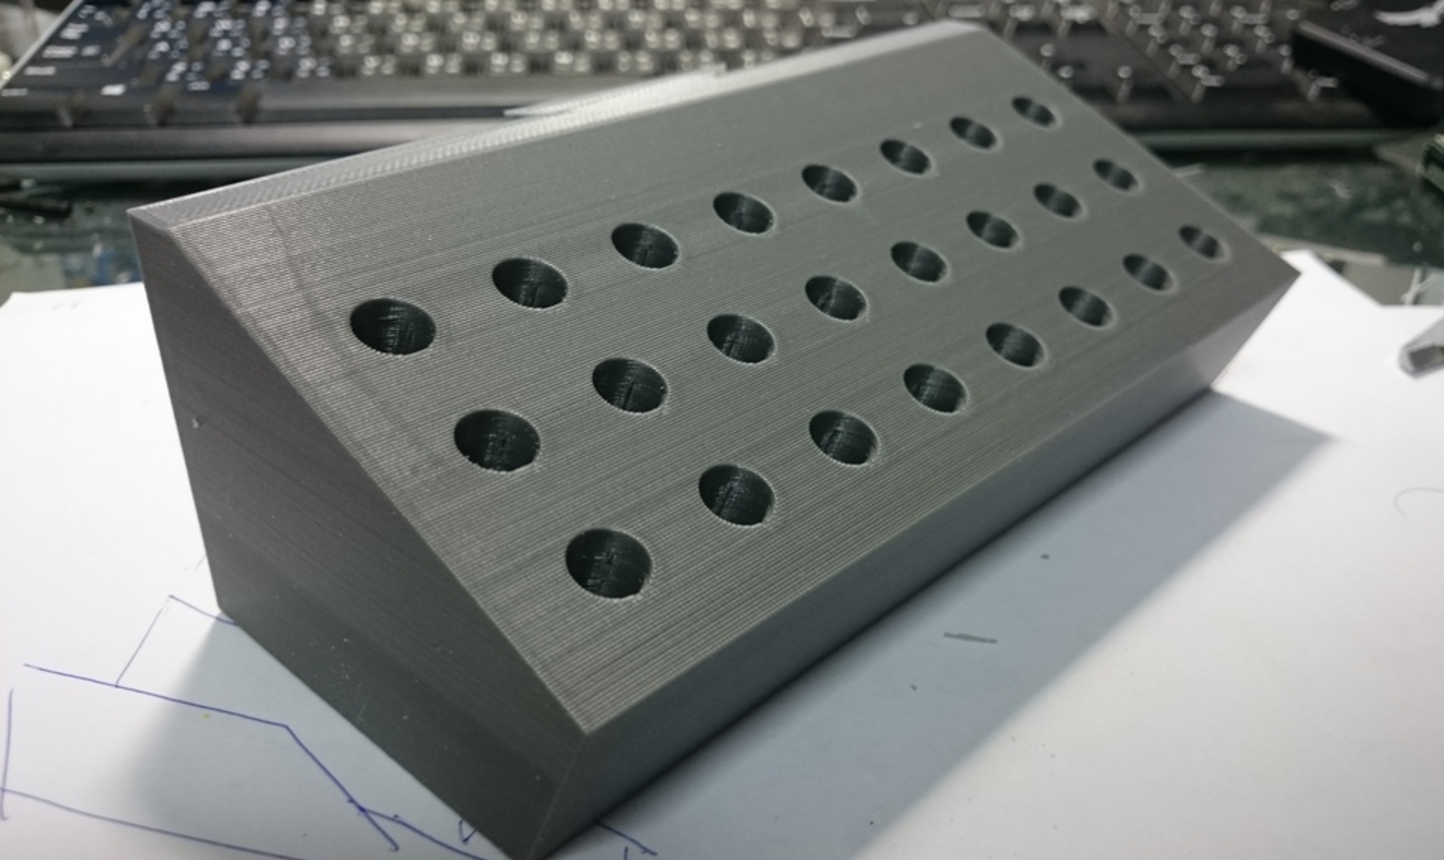 Capture d'écran 2017-06-01 à 10.58.30.png Download free STL file Wiha screwdrivers holder-for Shuter workbenches • 3D print model, SidneyHuang